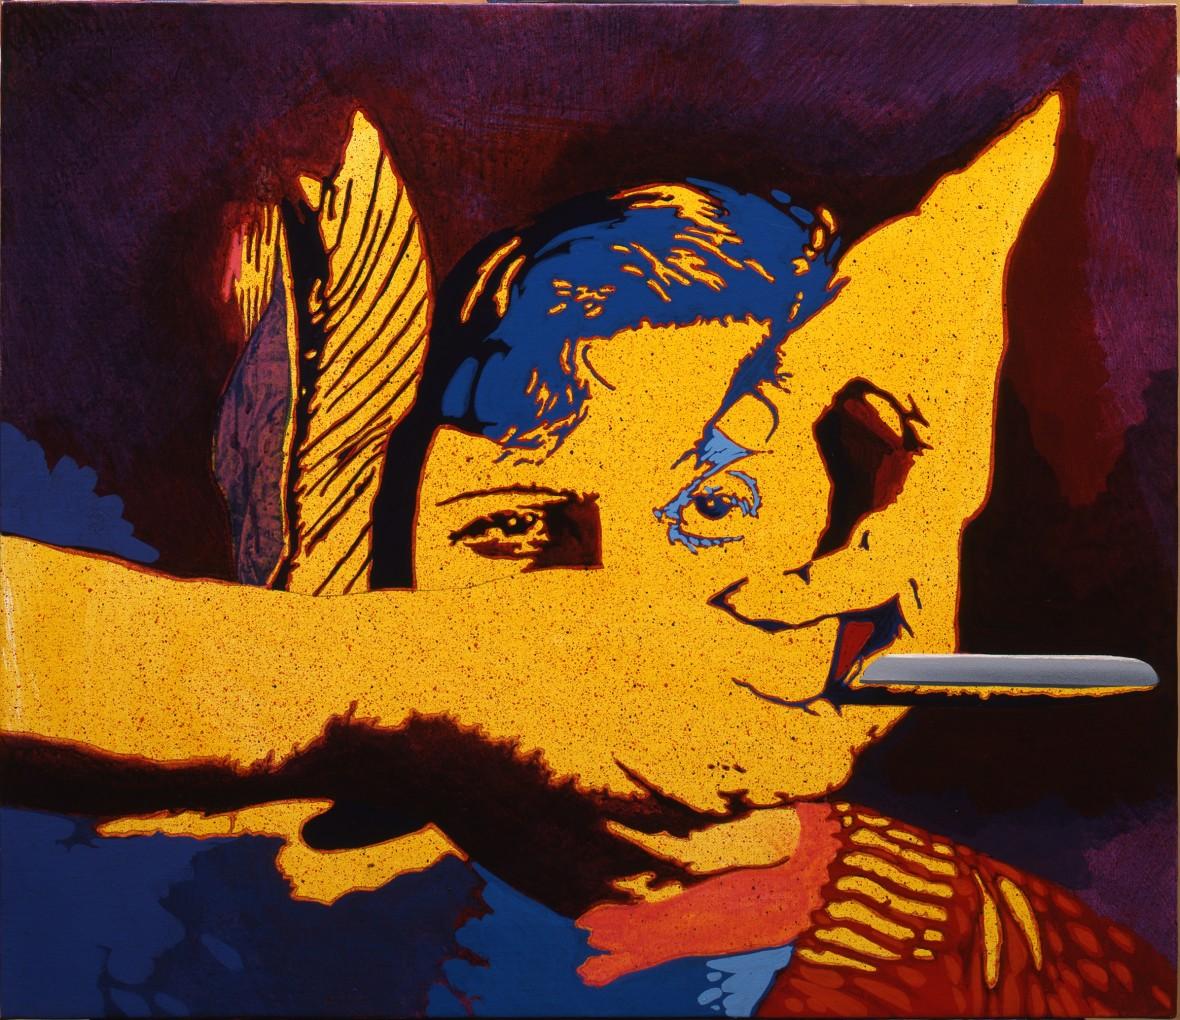 <p><strong>Giangiacomo Spadari</strong></p><p><em>Il cane andaluso</em>, 1977</p><p>Acrylic on canvas 60x70cm</p>